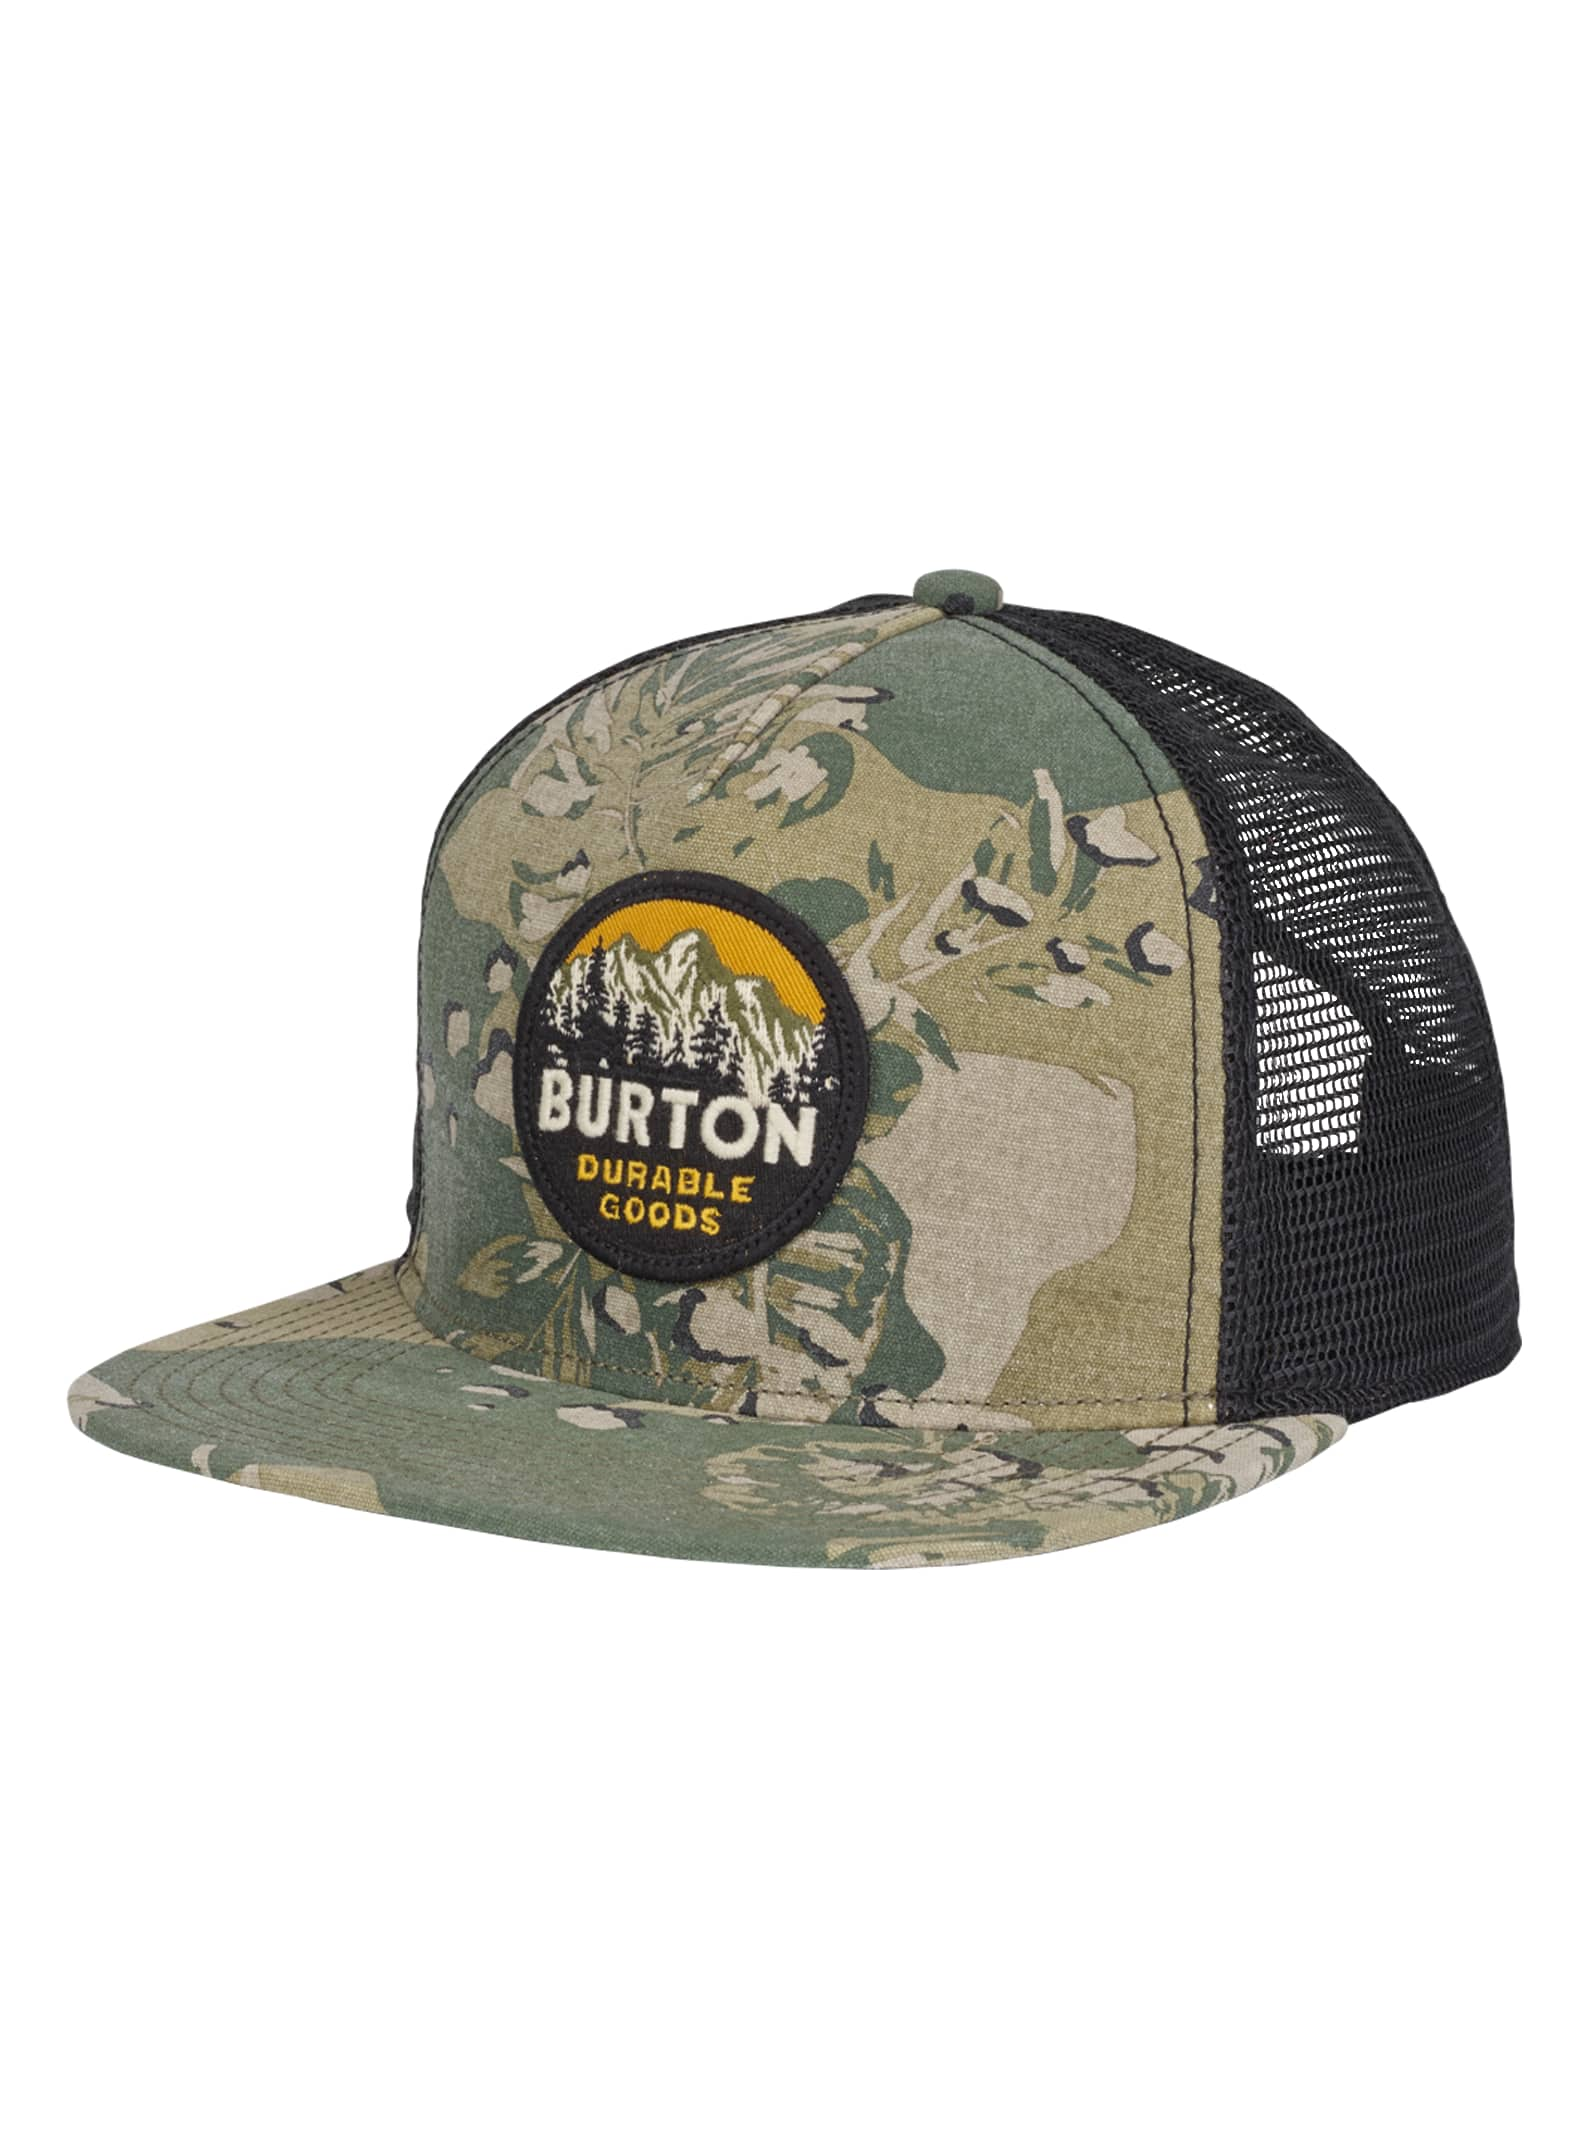 Burton Marble Head Hat  8e7202c002d